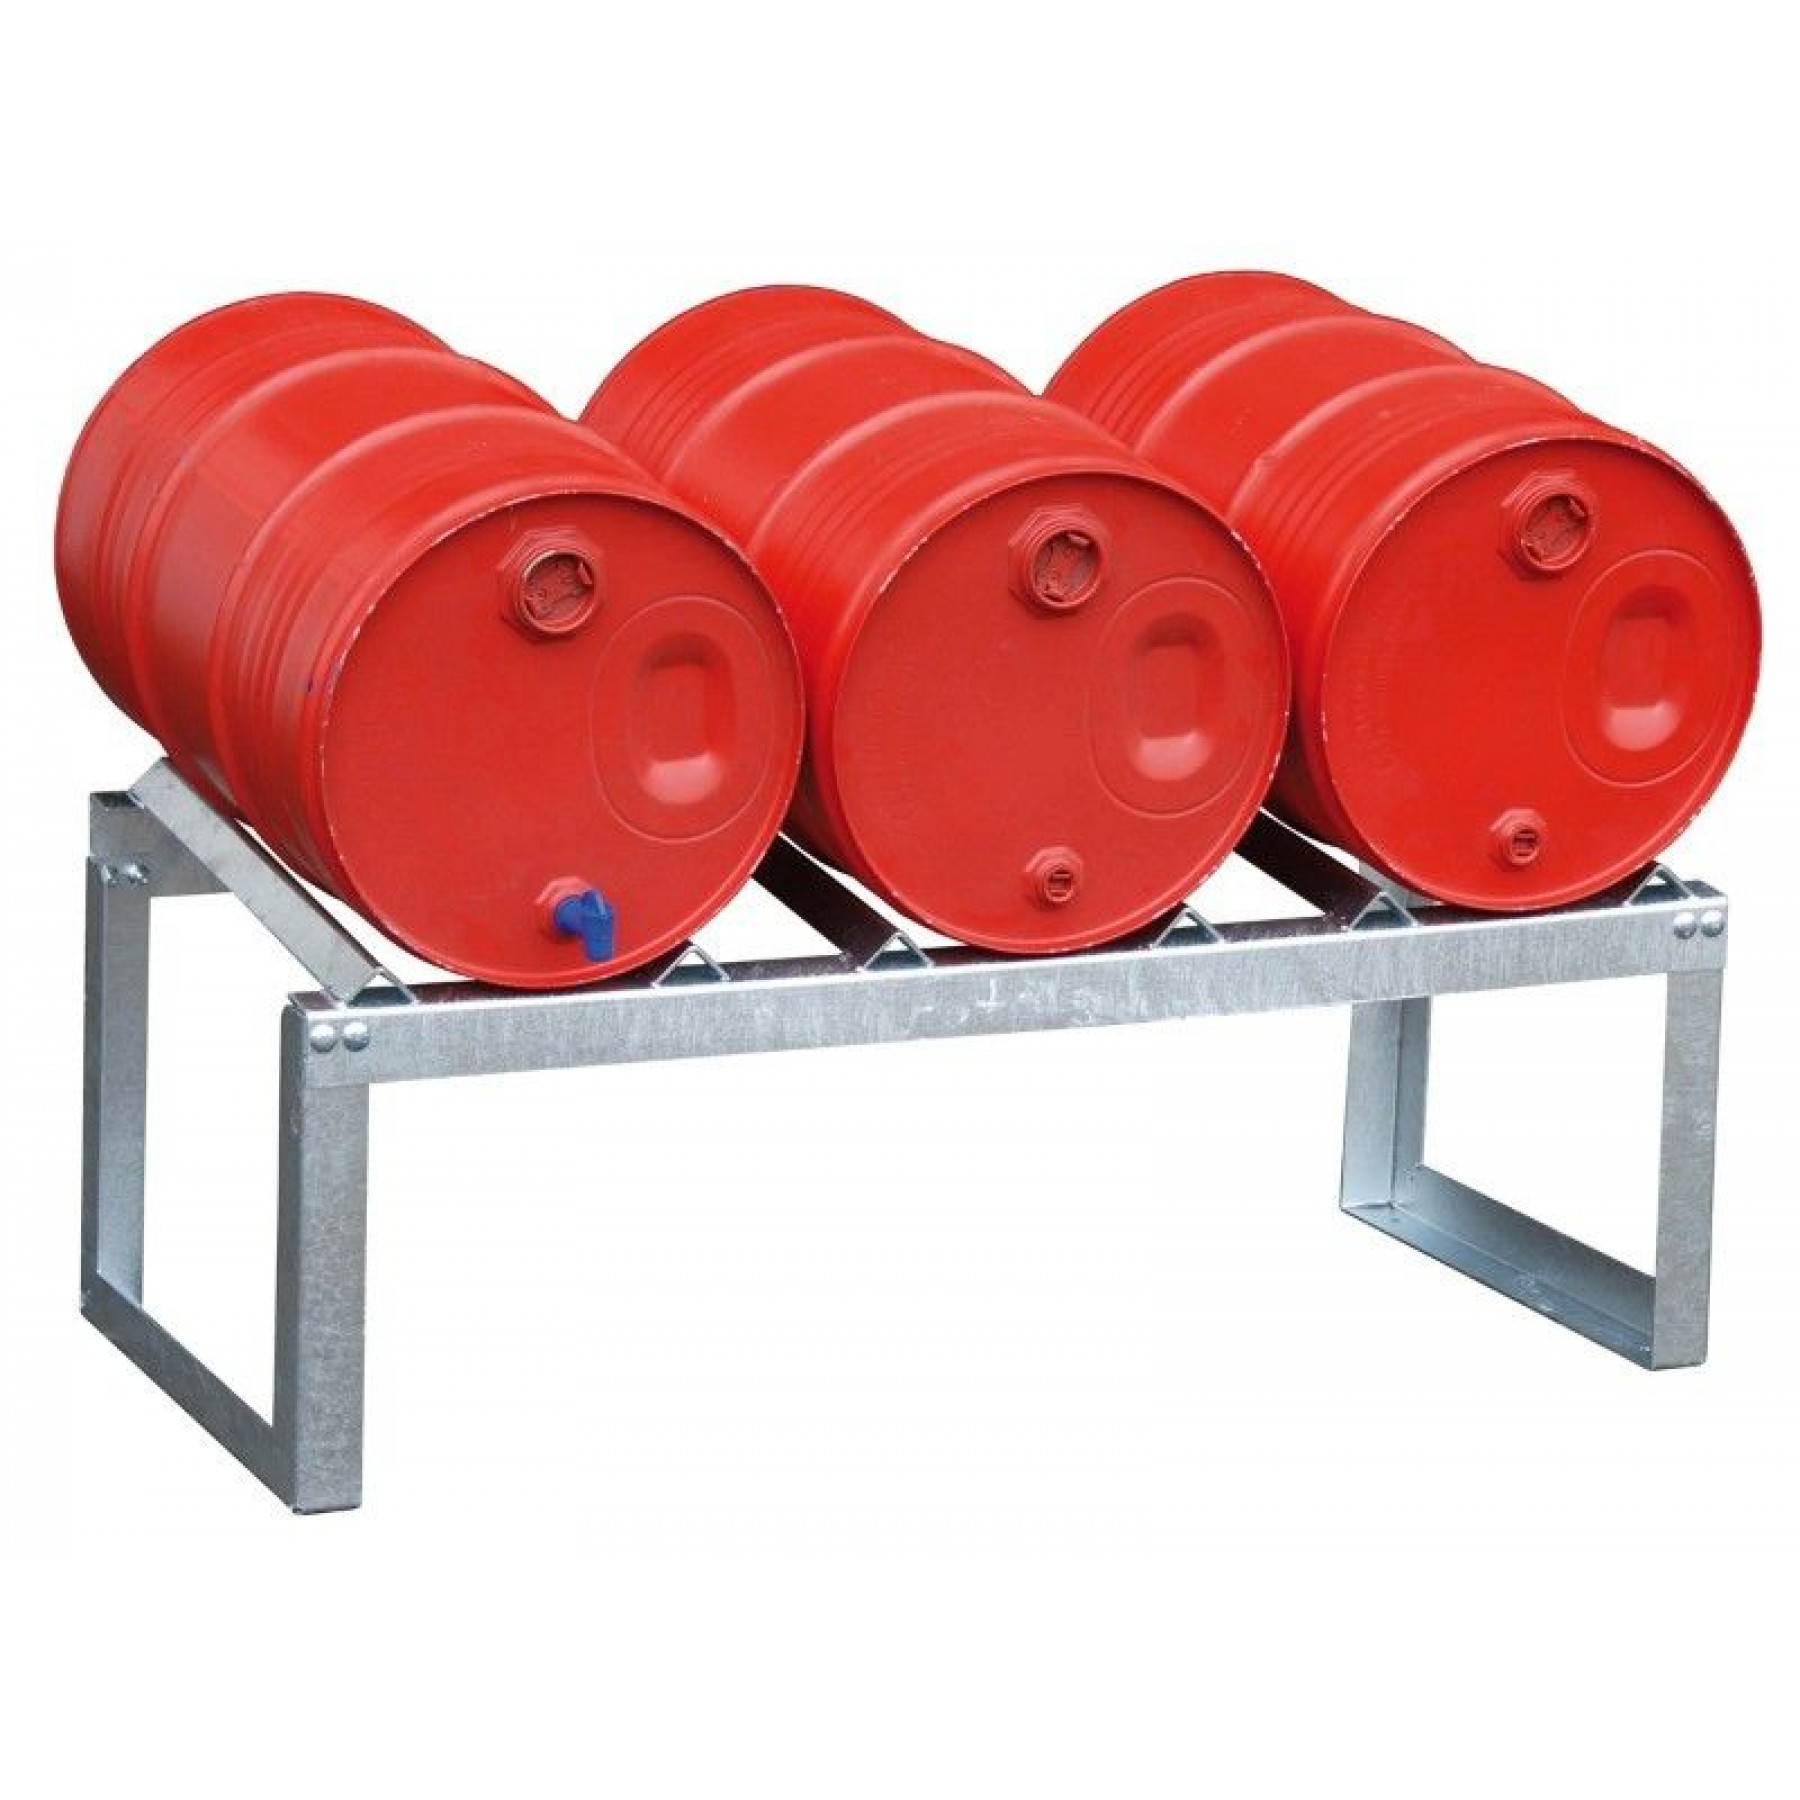 Vatenrek t.b.v. 3 x 60 liter vaten, verzinkt, 70049-FA60-3